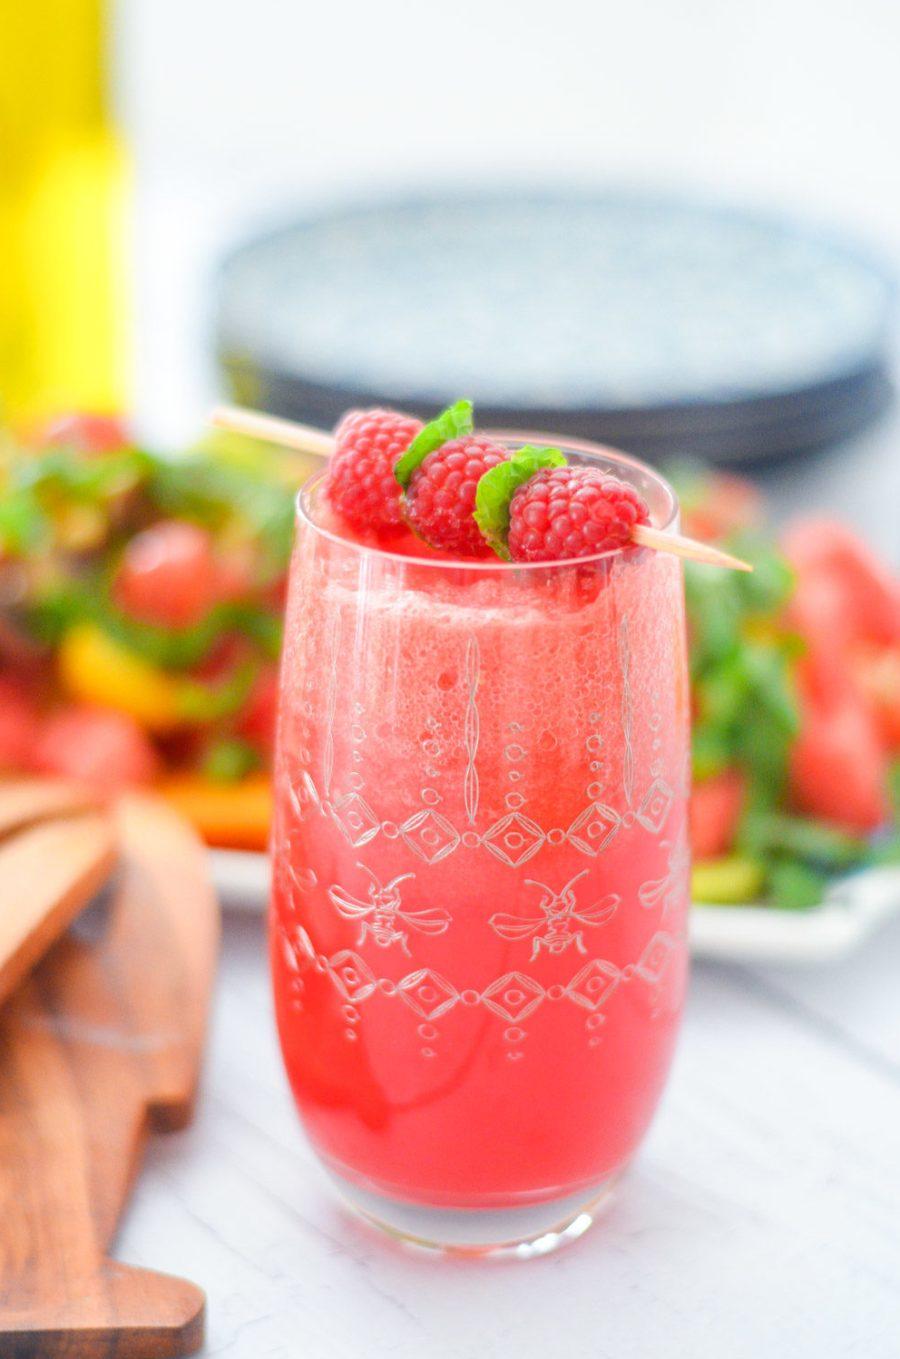 IZZE Watermelon Raspberry Sparkling Water Drink Recipe w. Watermelon Juice | Summer Produce Recipes